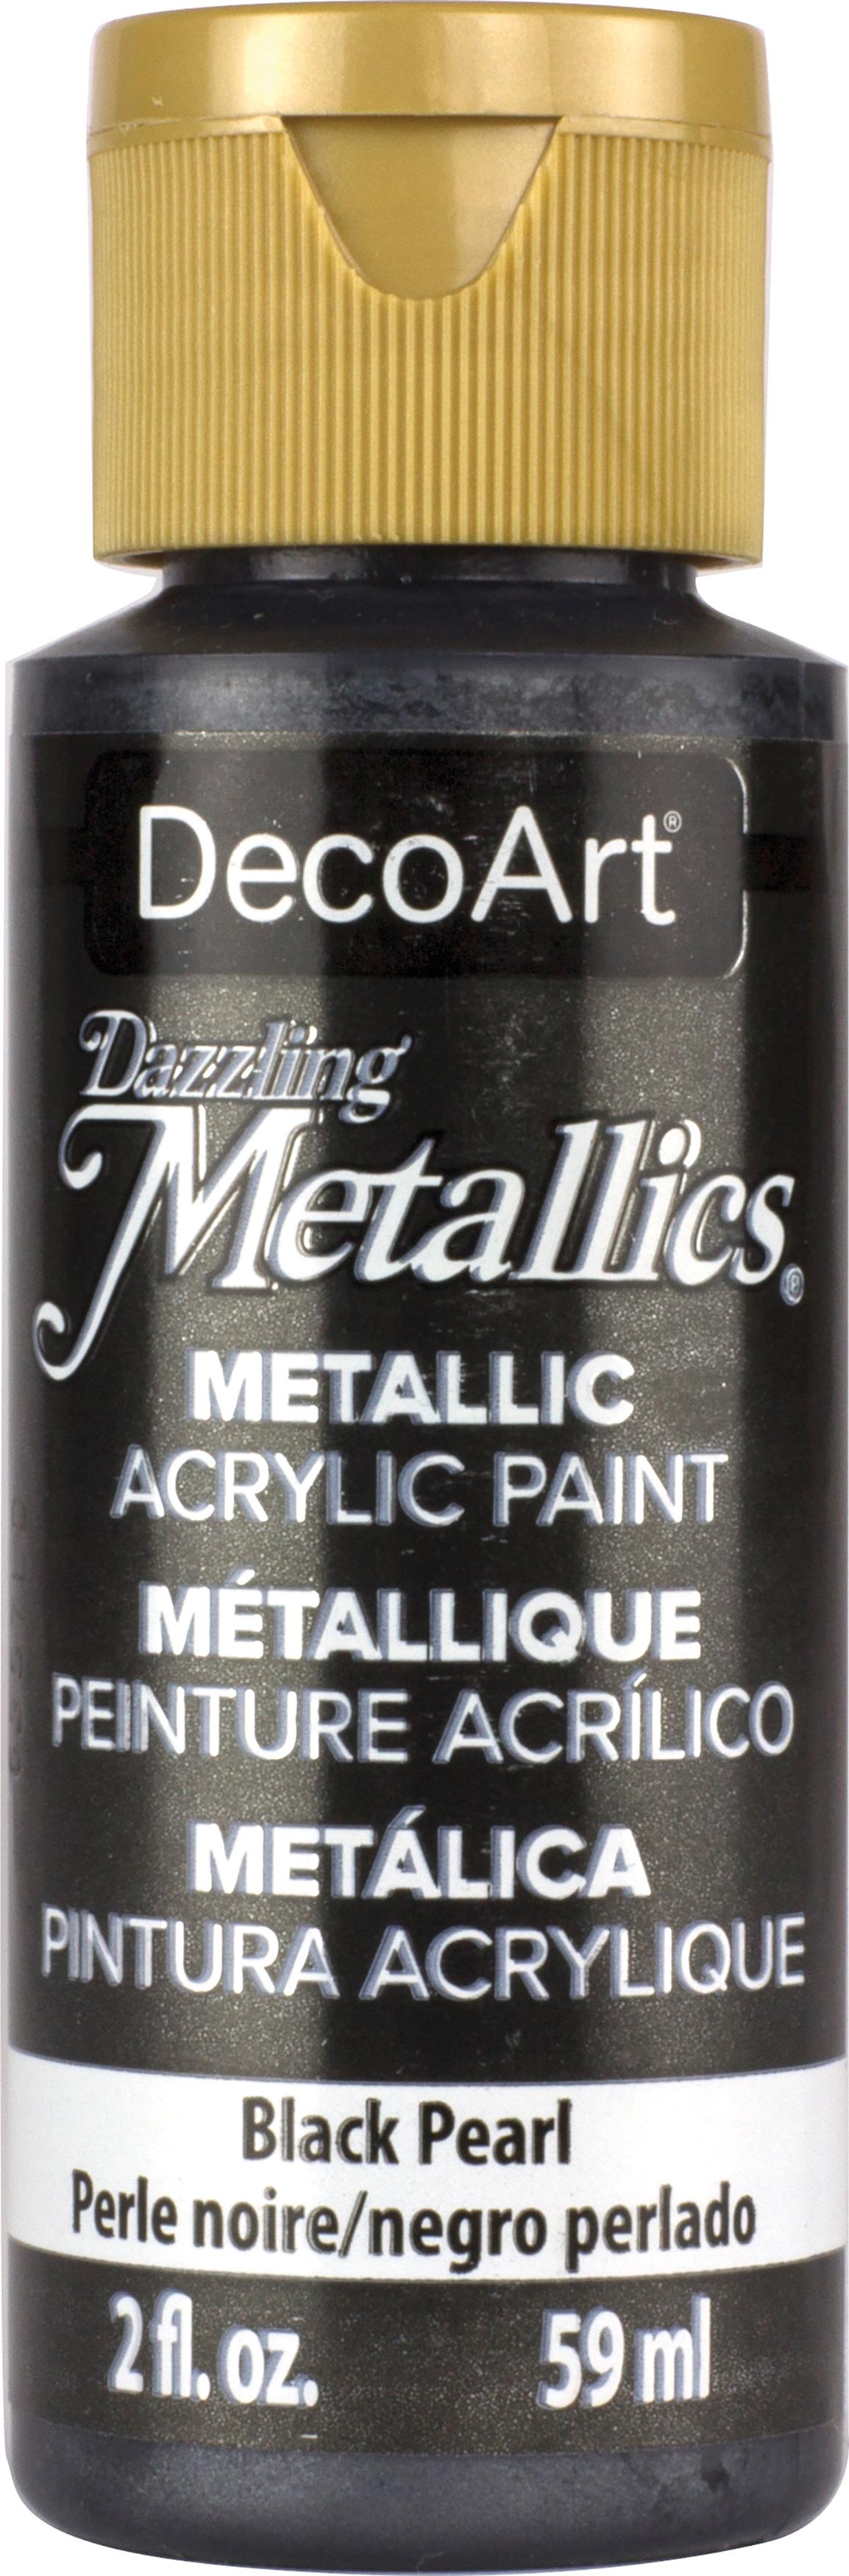 DecoArt-Dazzling-Metallics-2-Ounce-Black-Pearl-Acrylic-Paint